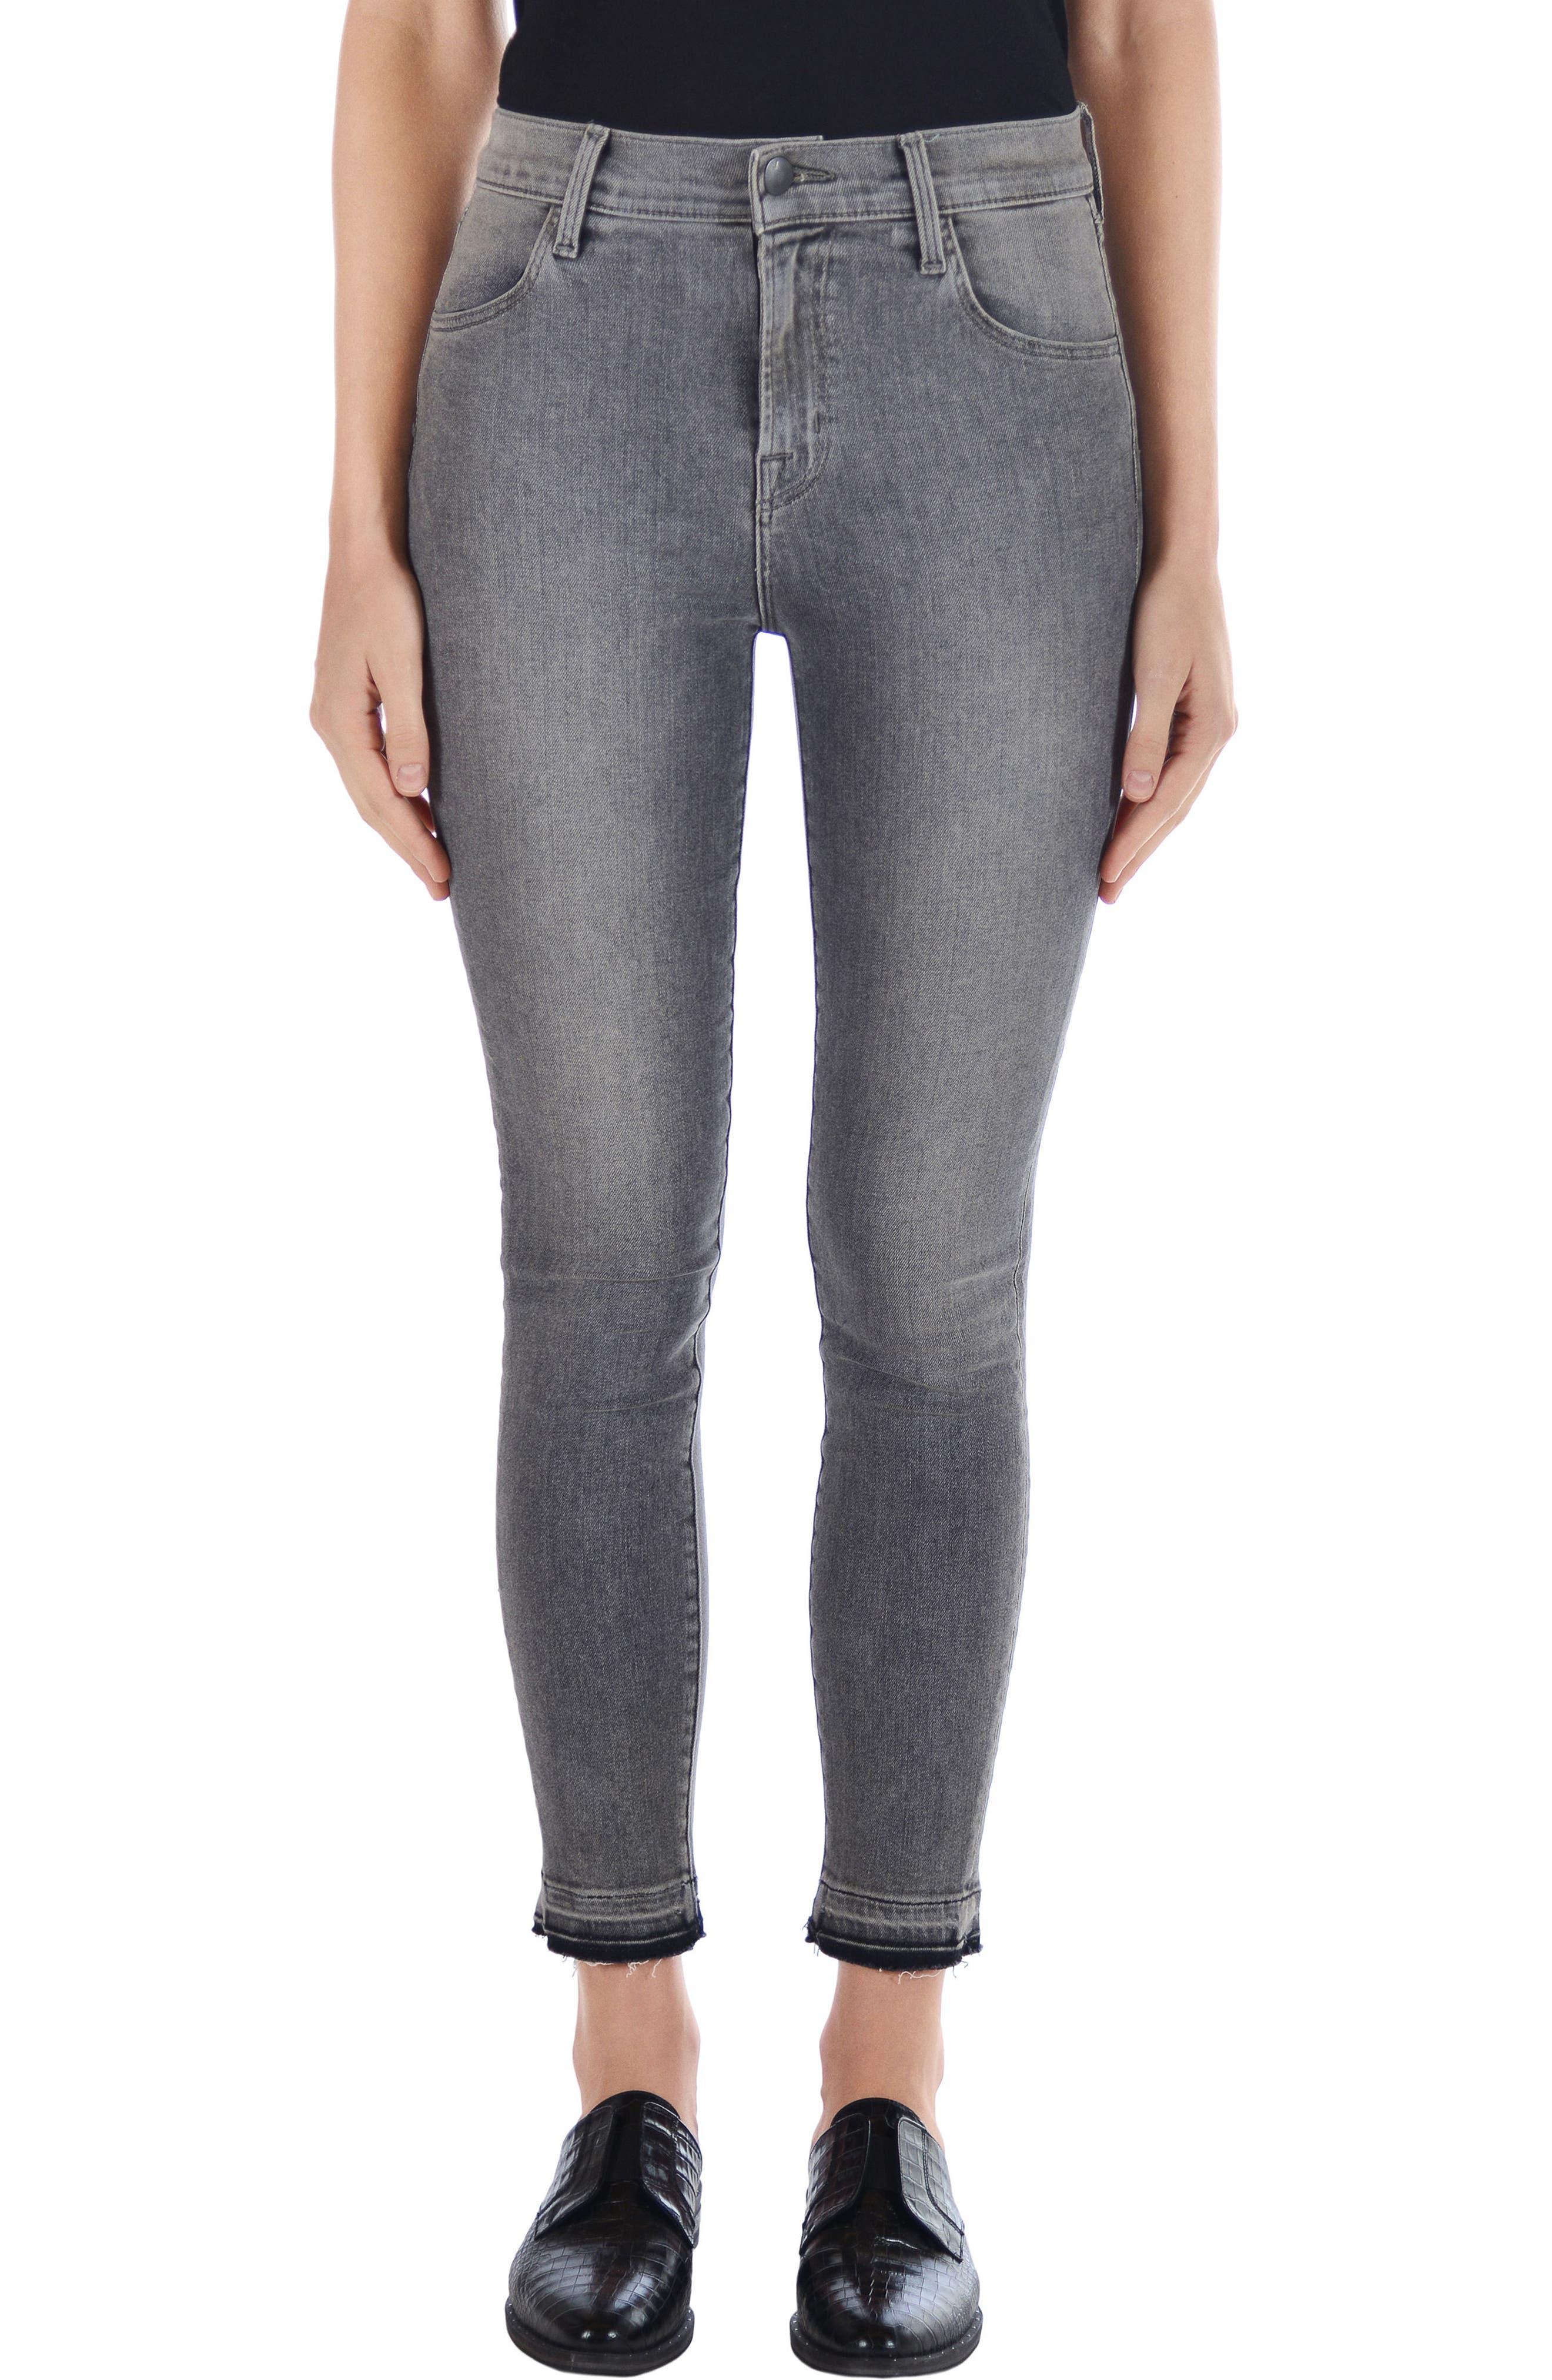 Alana High Waist Ankle Skinny Jeans,                             Main thumbnail 1, color,                             030